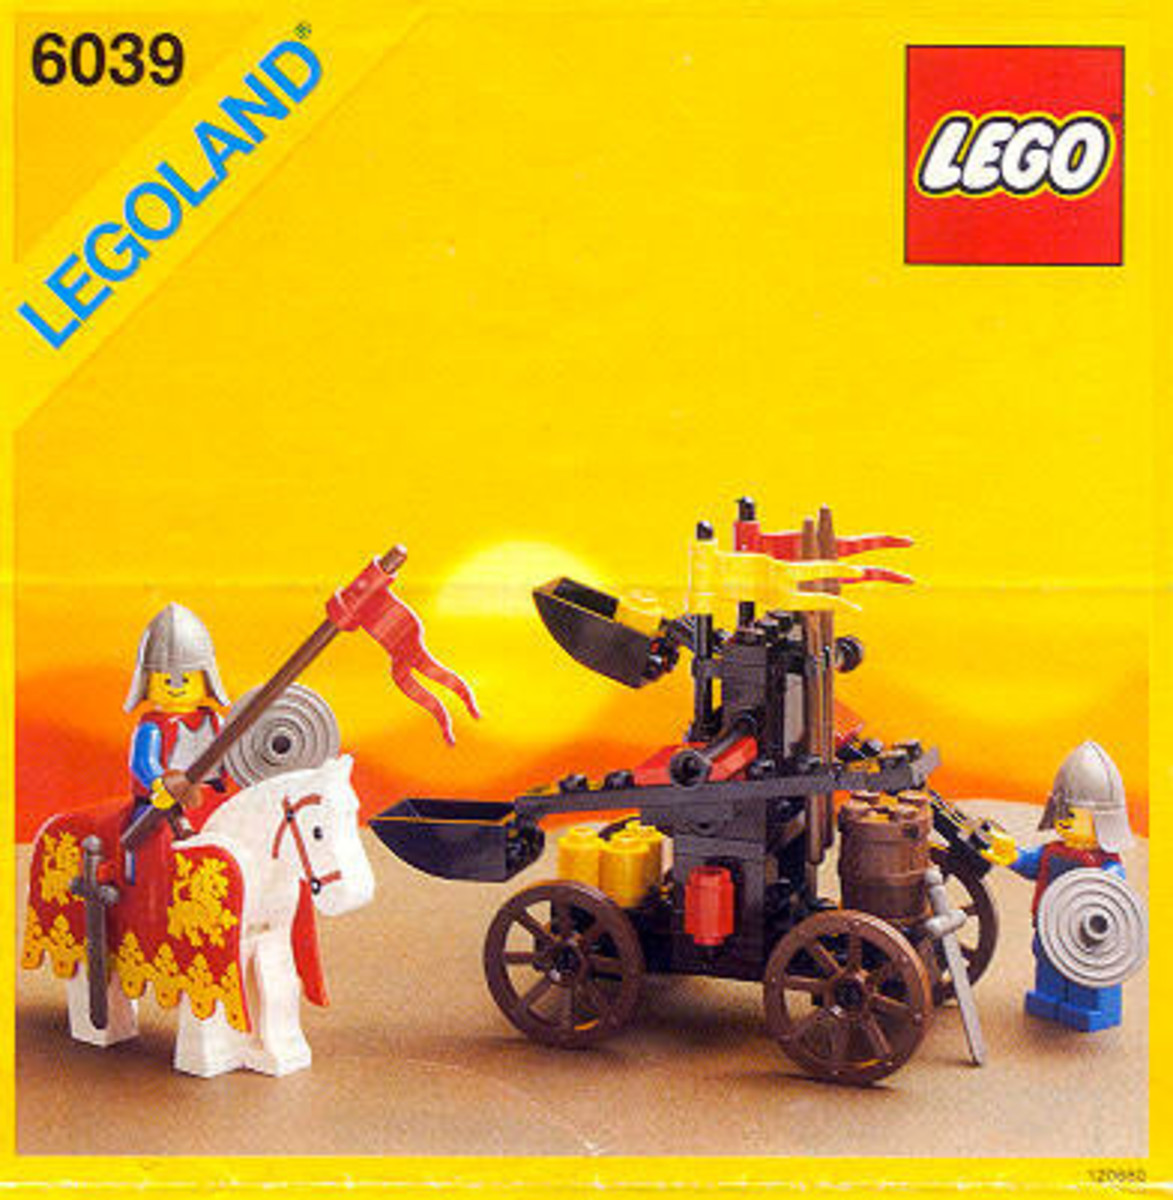 legocrusaders